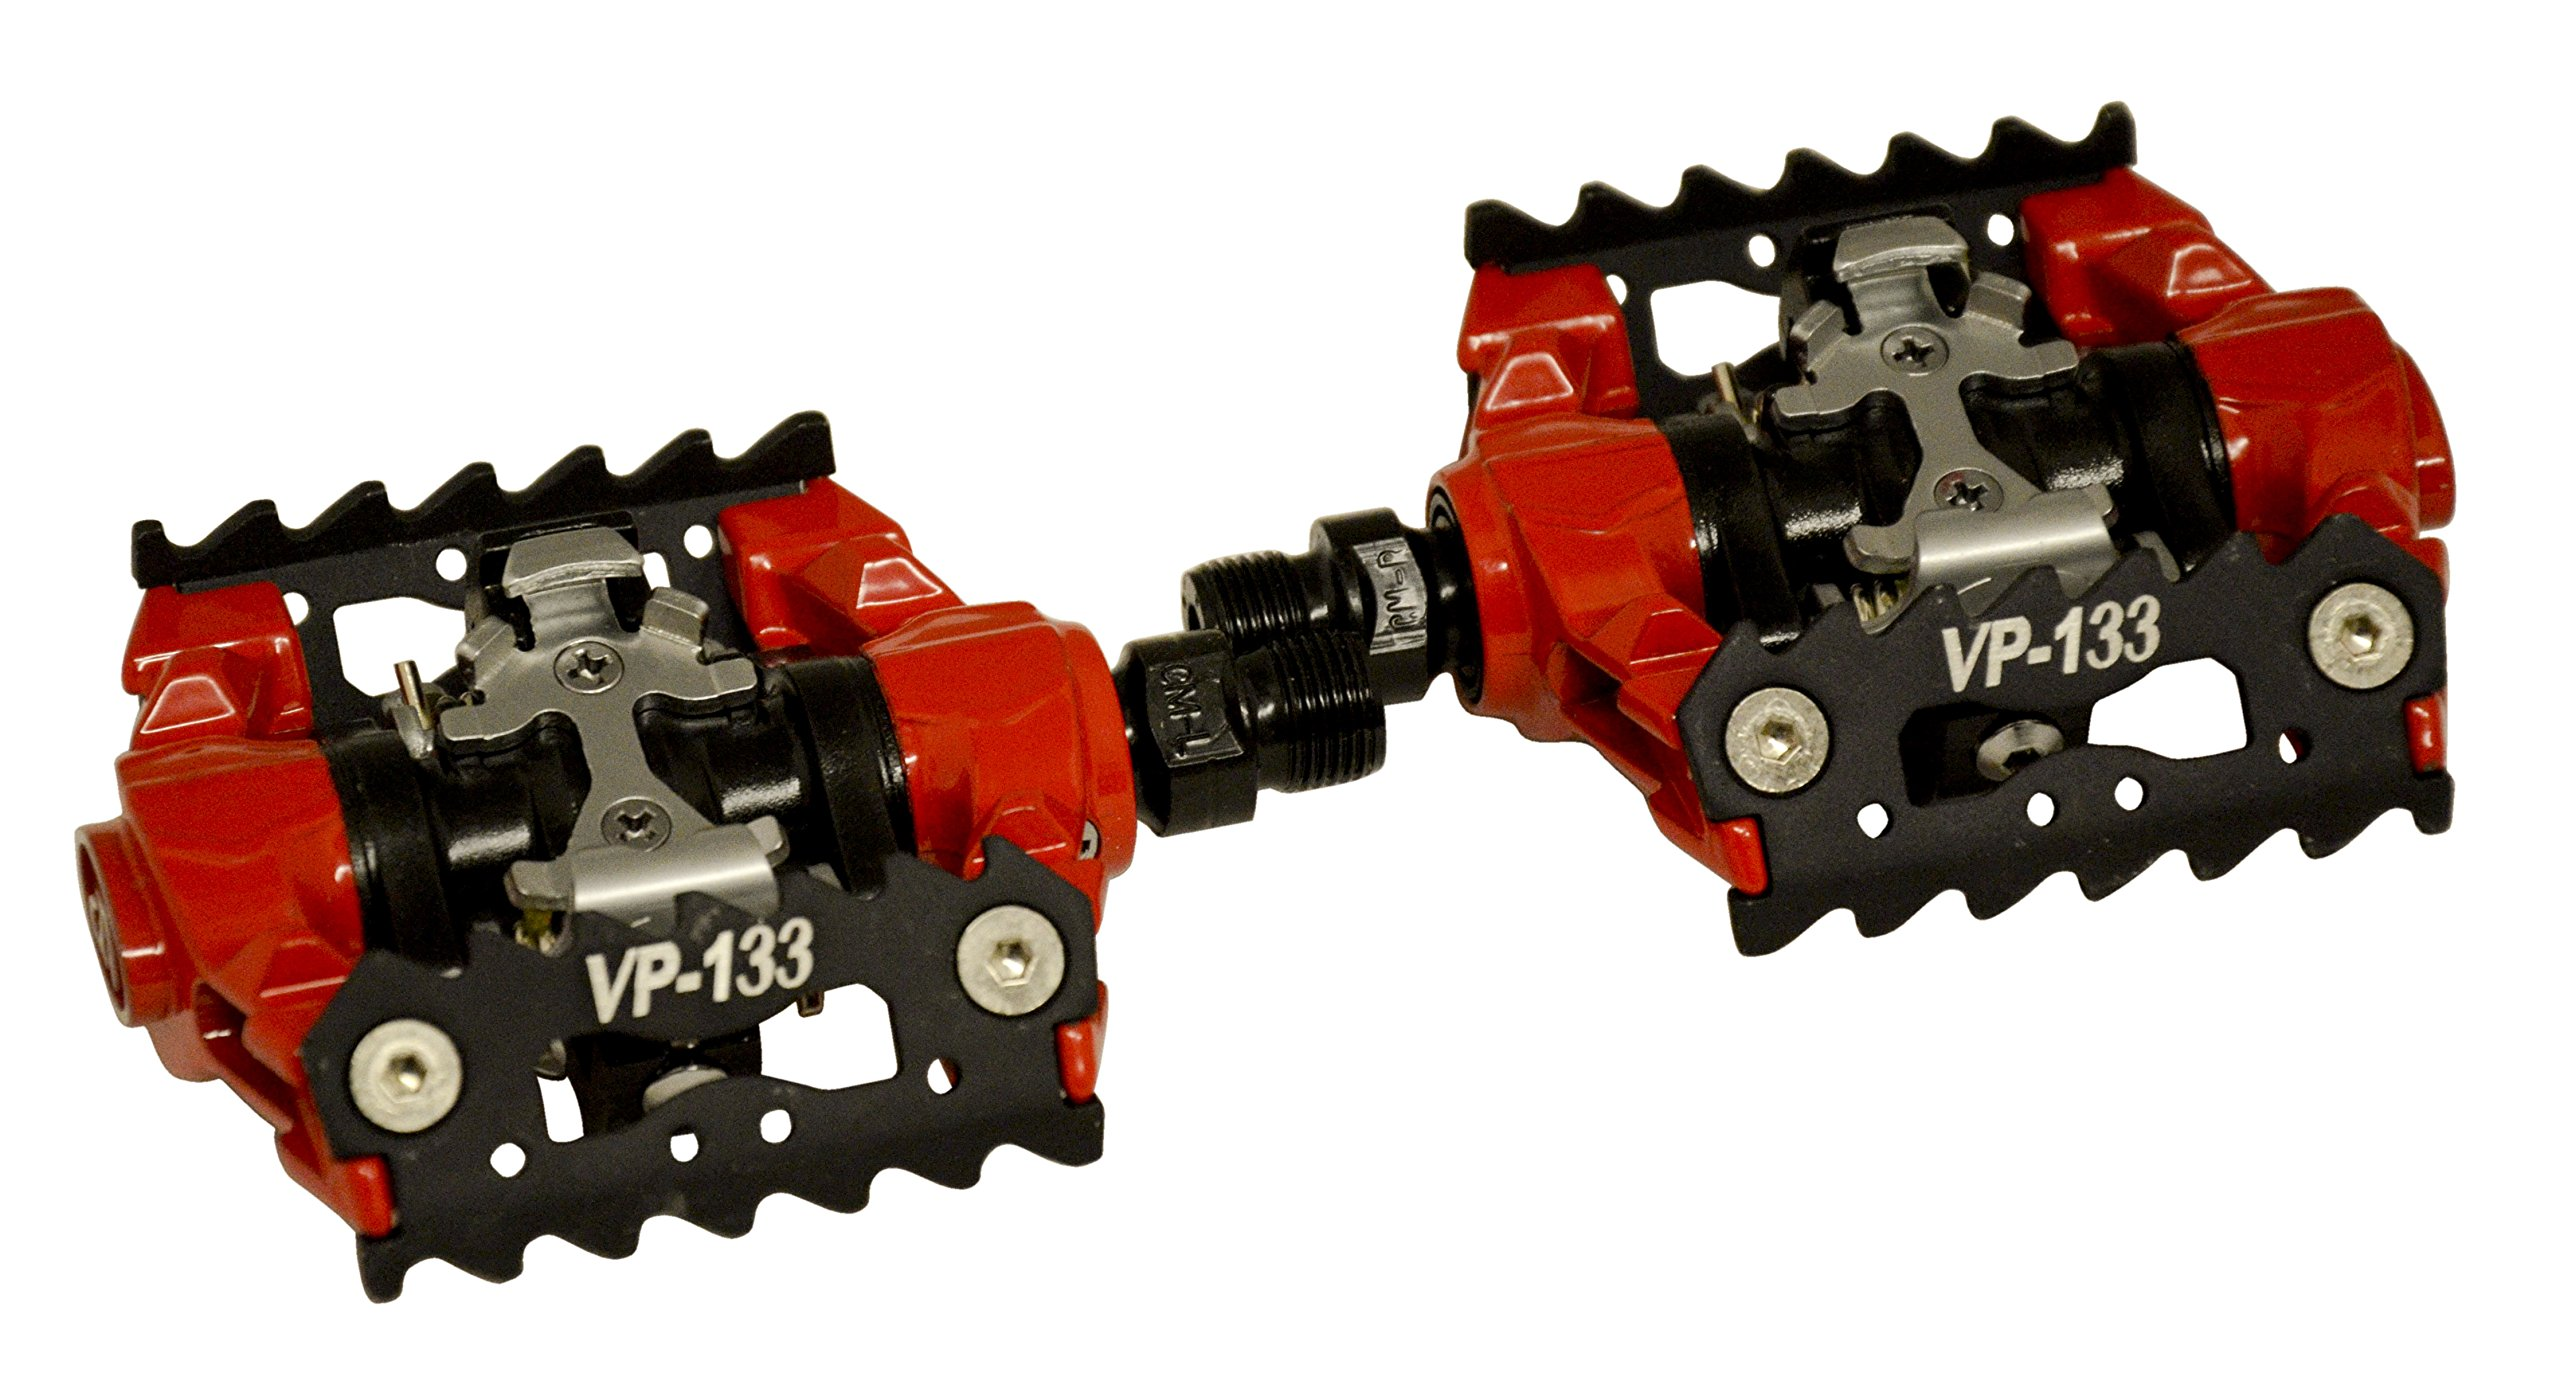 VP COMPONENTES 133 Pedal de Bicicleta de montaña, Unisex, Rojo ...